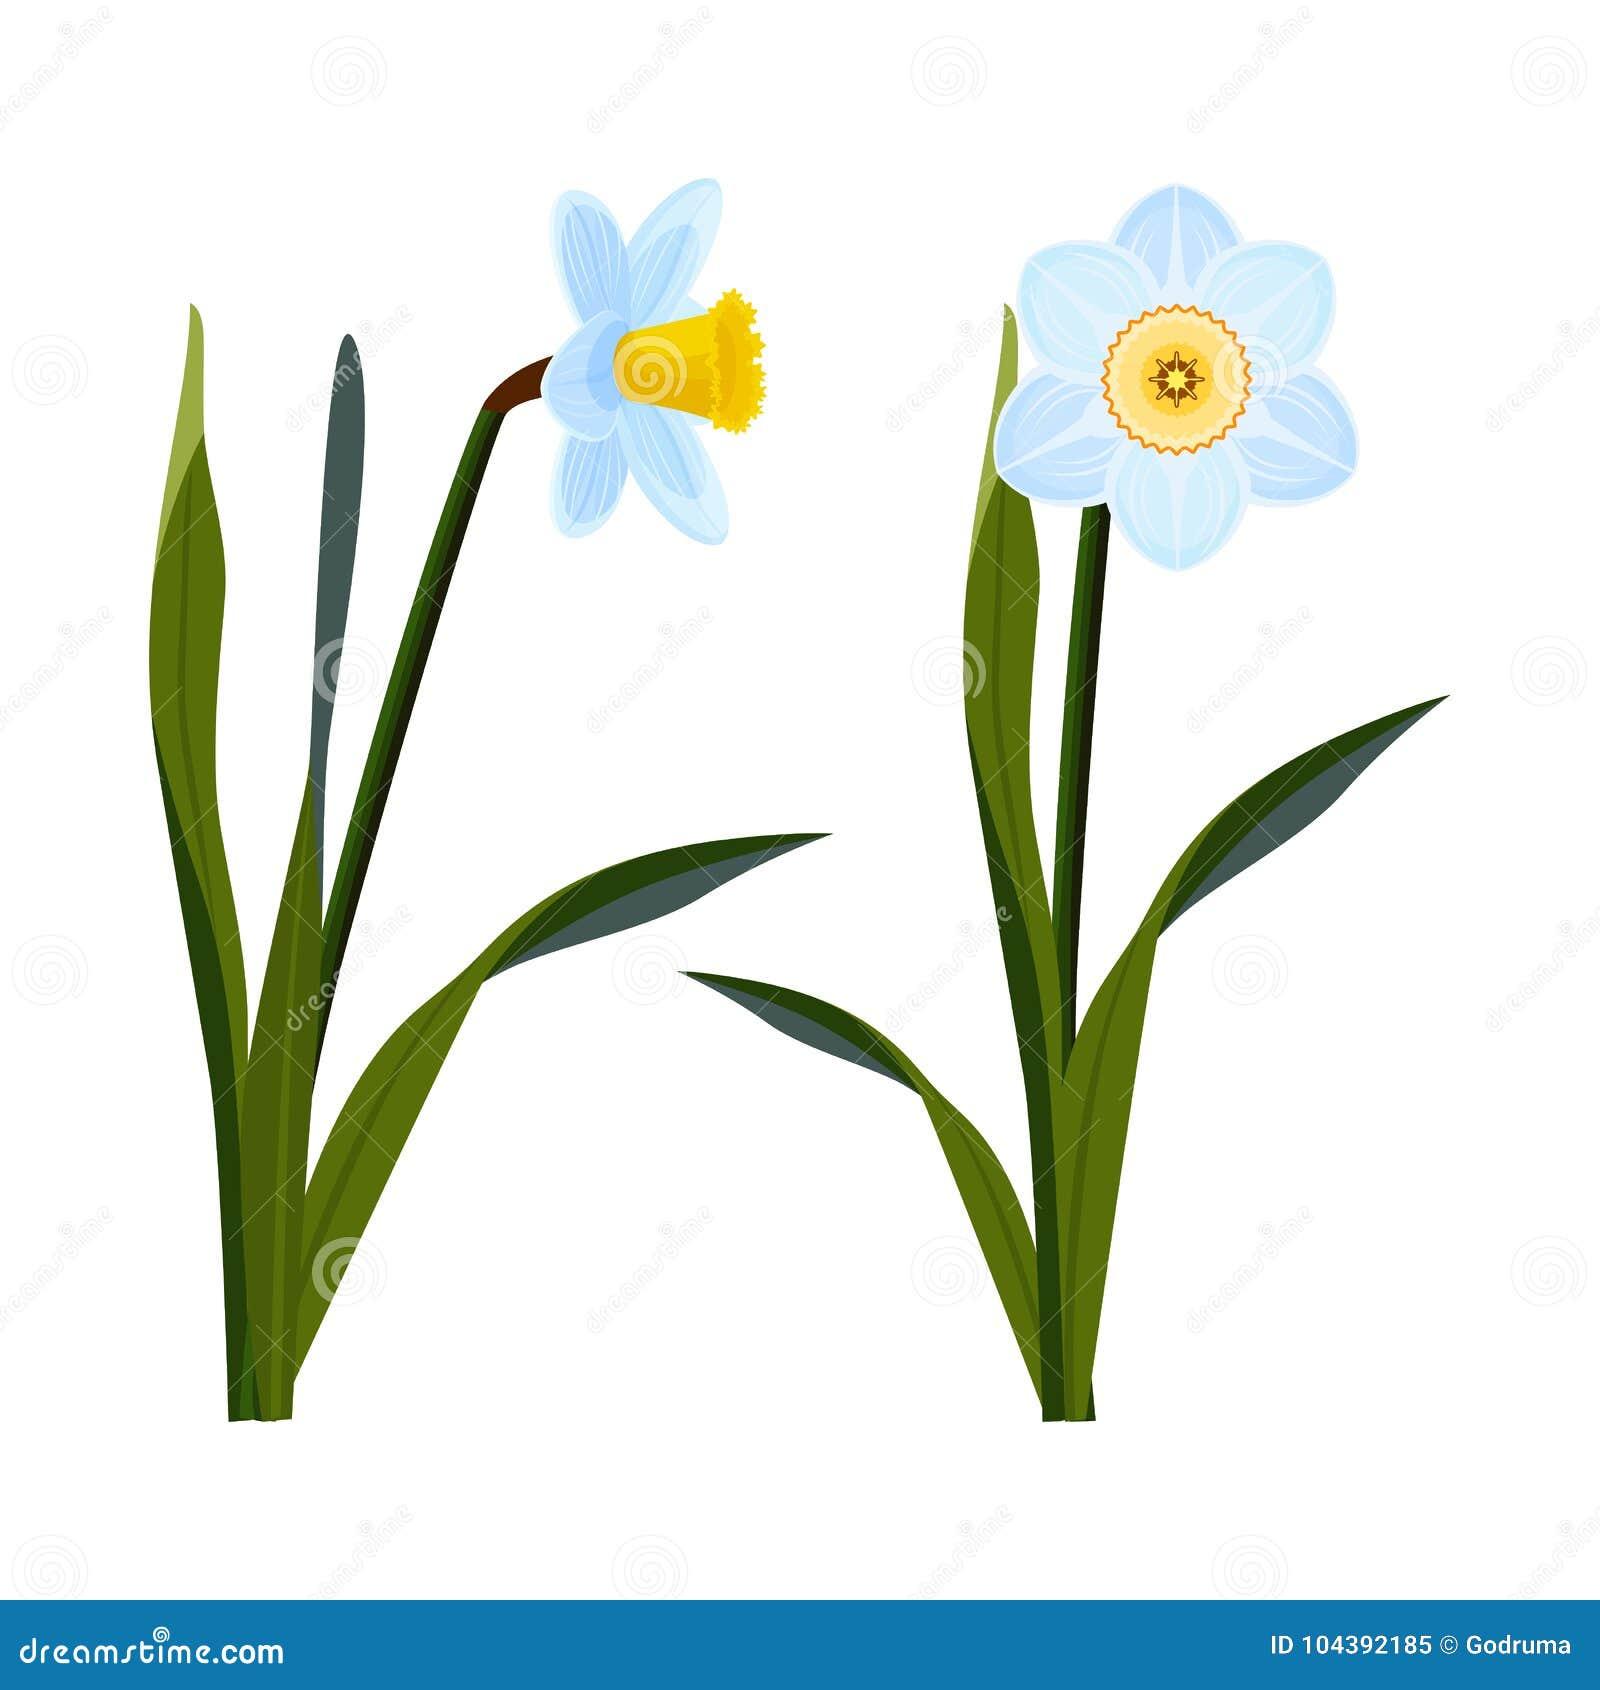 Daffodils με τους ανοικτούς μπλε οφθαλμούς και το μακροχρόνιο πράσινο μίσχο